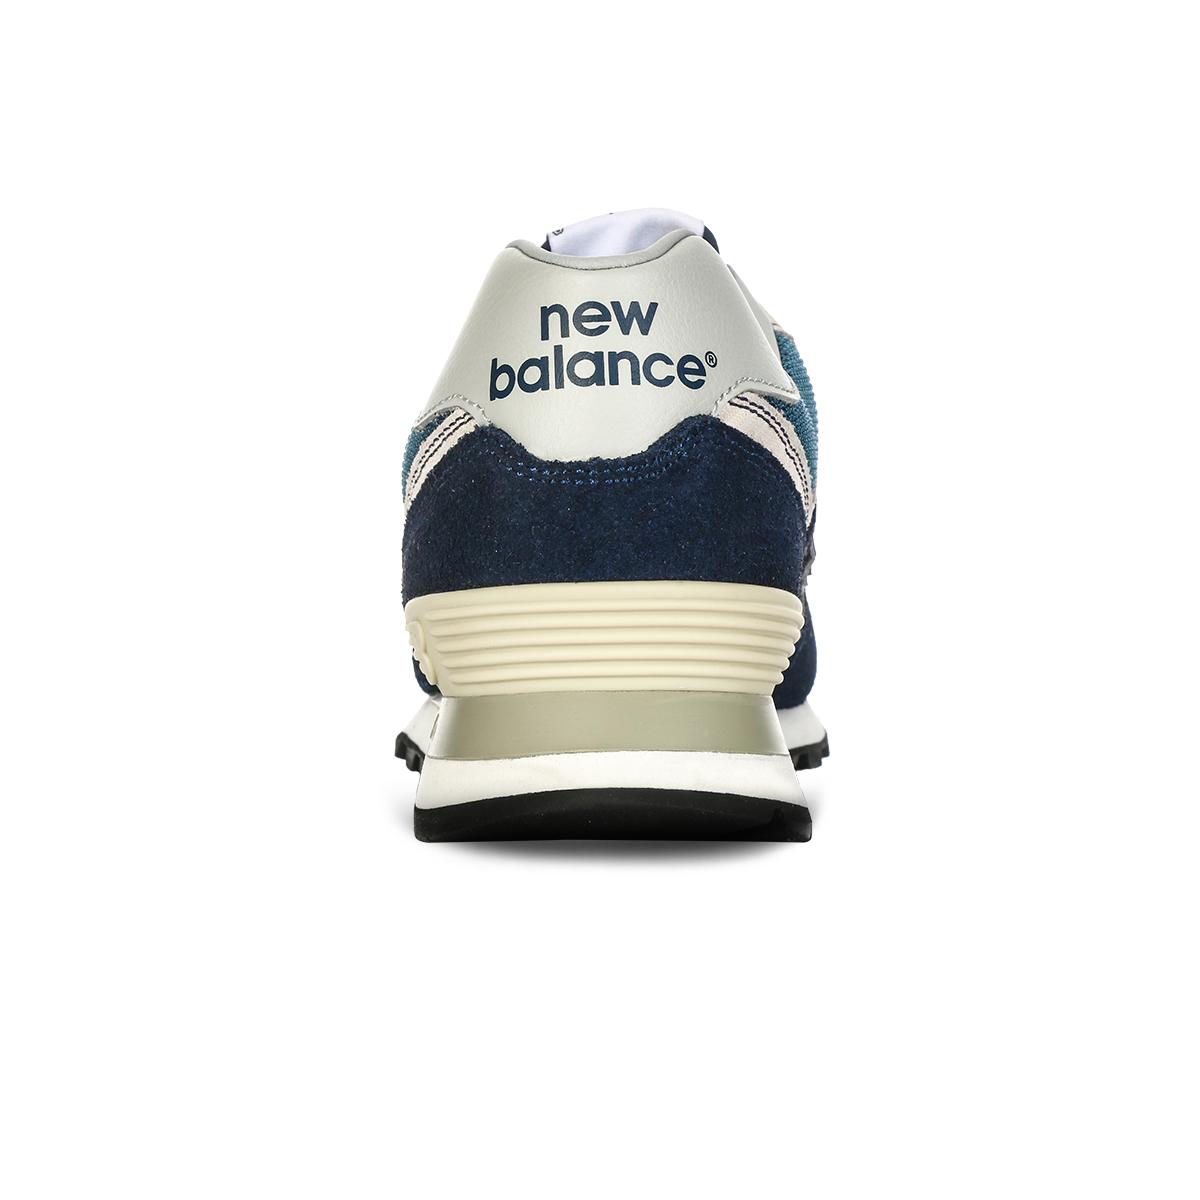 New Balance/NB 574 series tricolor men\u0027s shoes women\u0027s shoes retro running  shoes sports shoes ML574VN